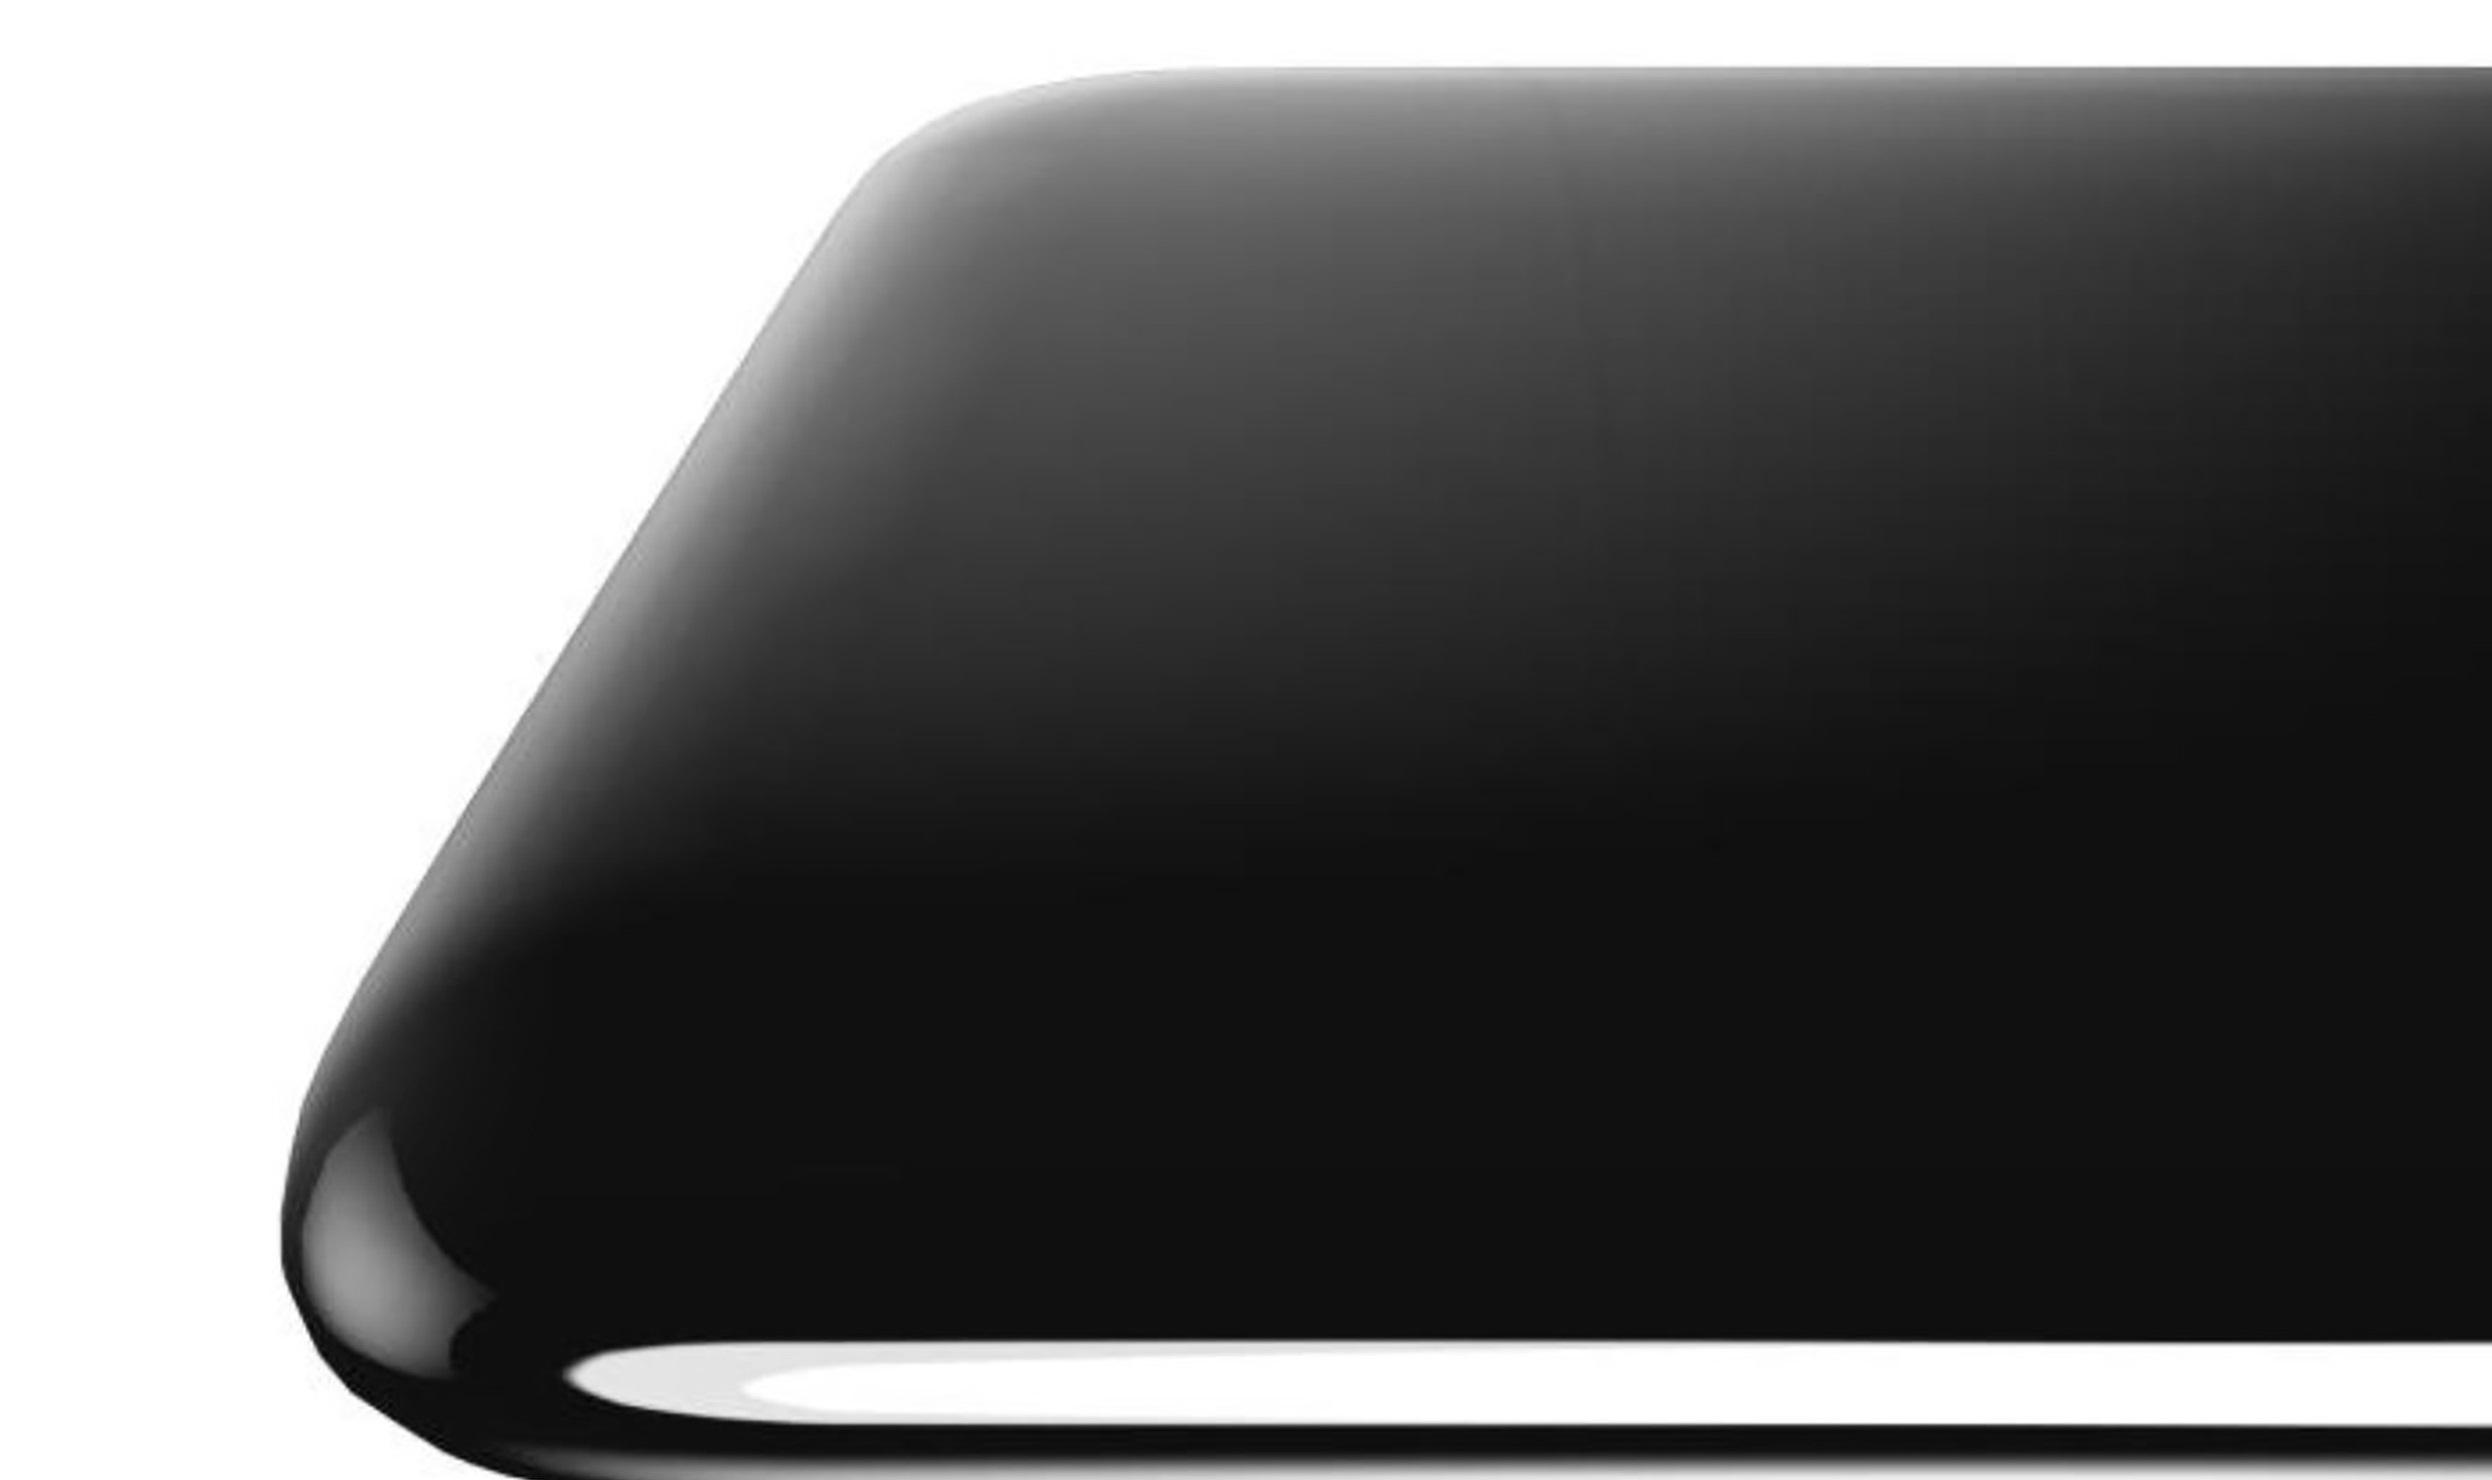 Apex 2019 : Vivo tease un smartphone sans aucun bouton ni prise USB